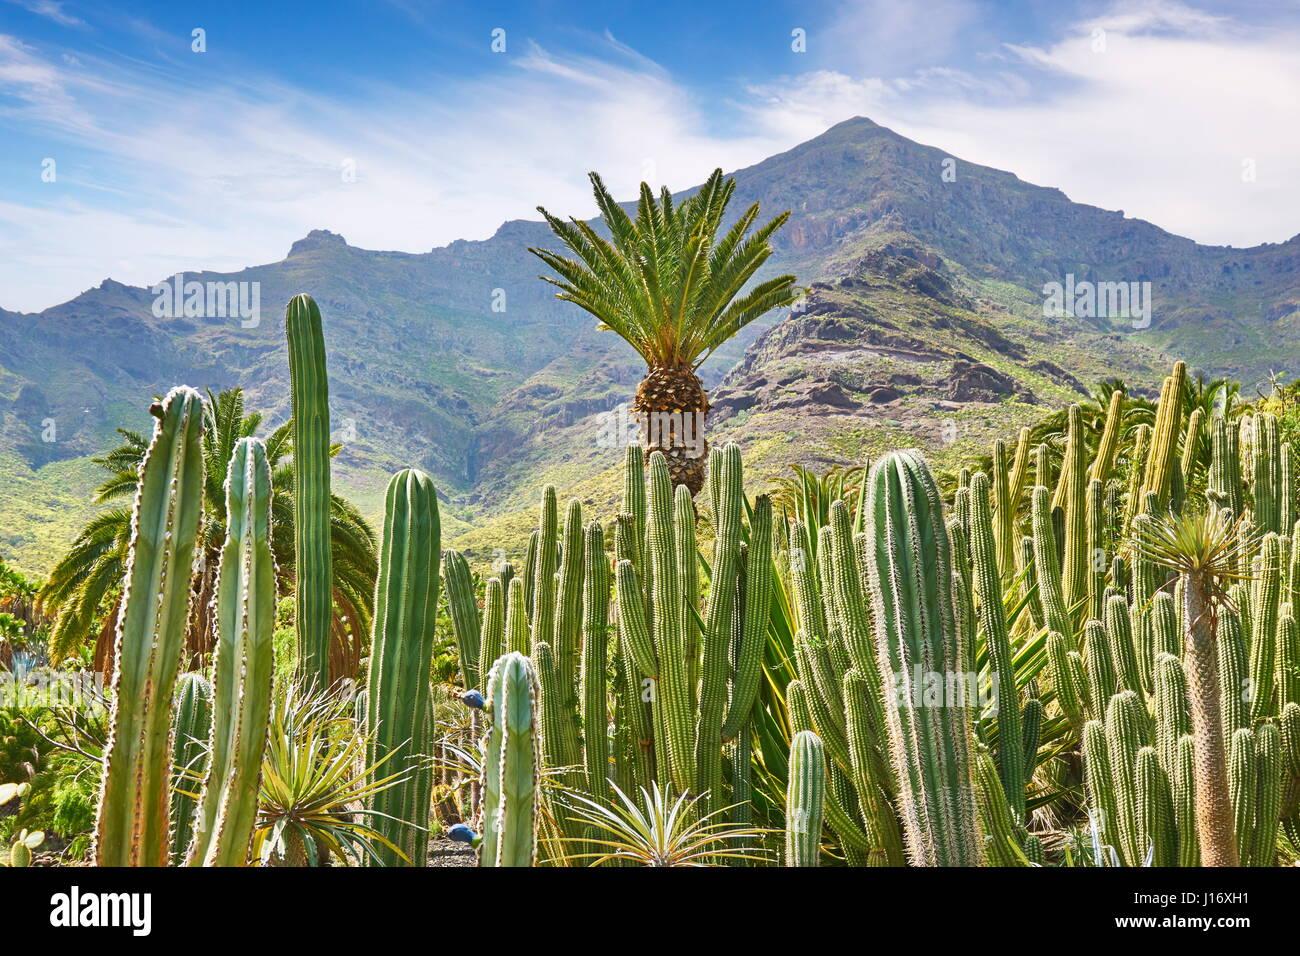 Jardín de Cactus paisaje, Gran Canaria, España Imagen De Stock